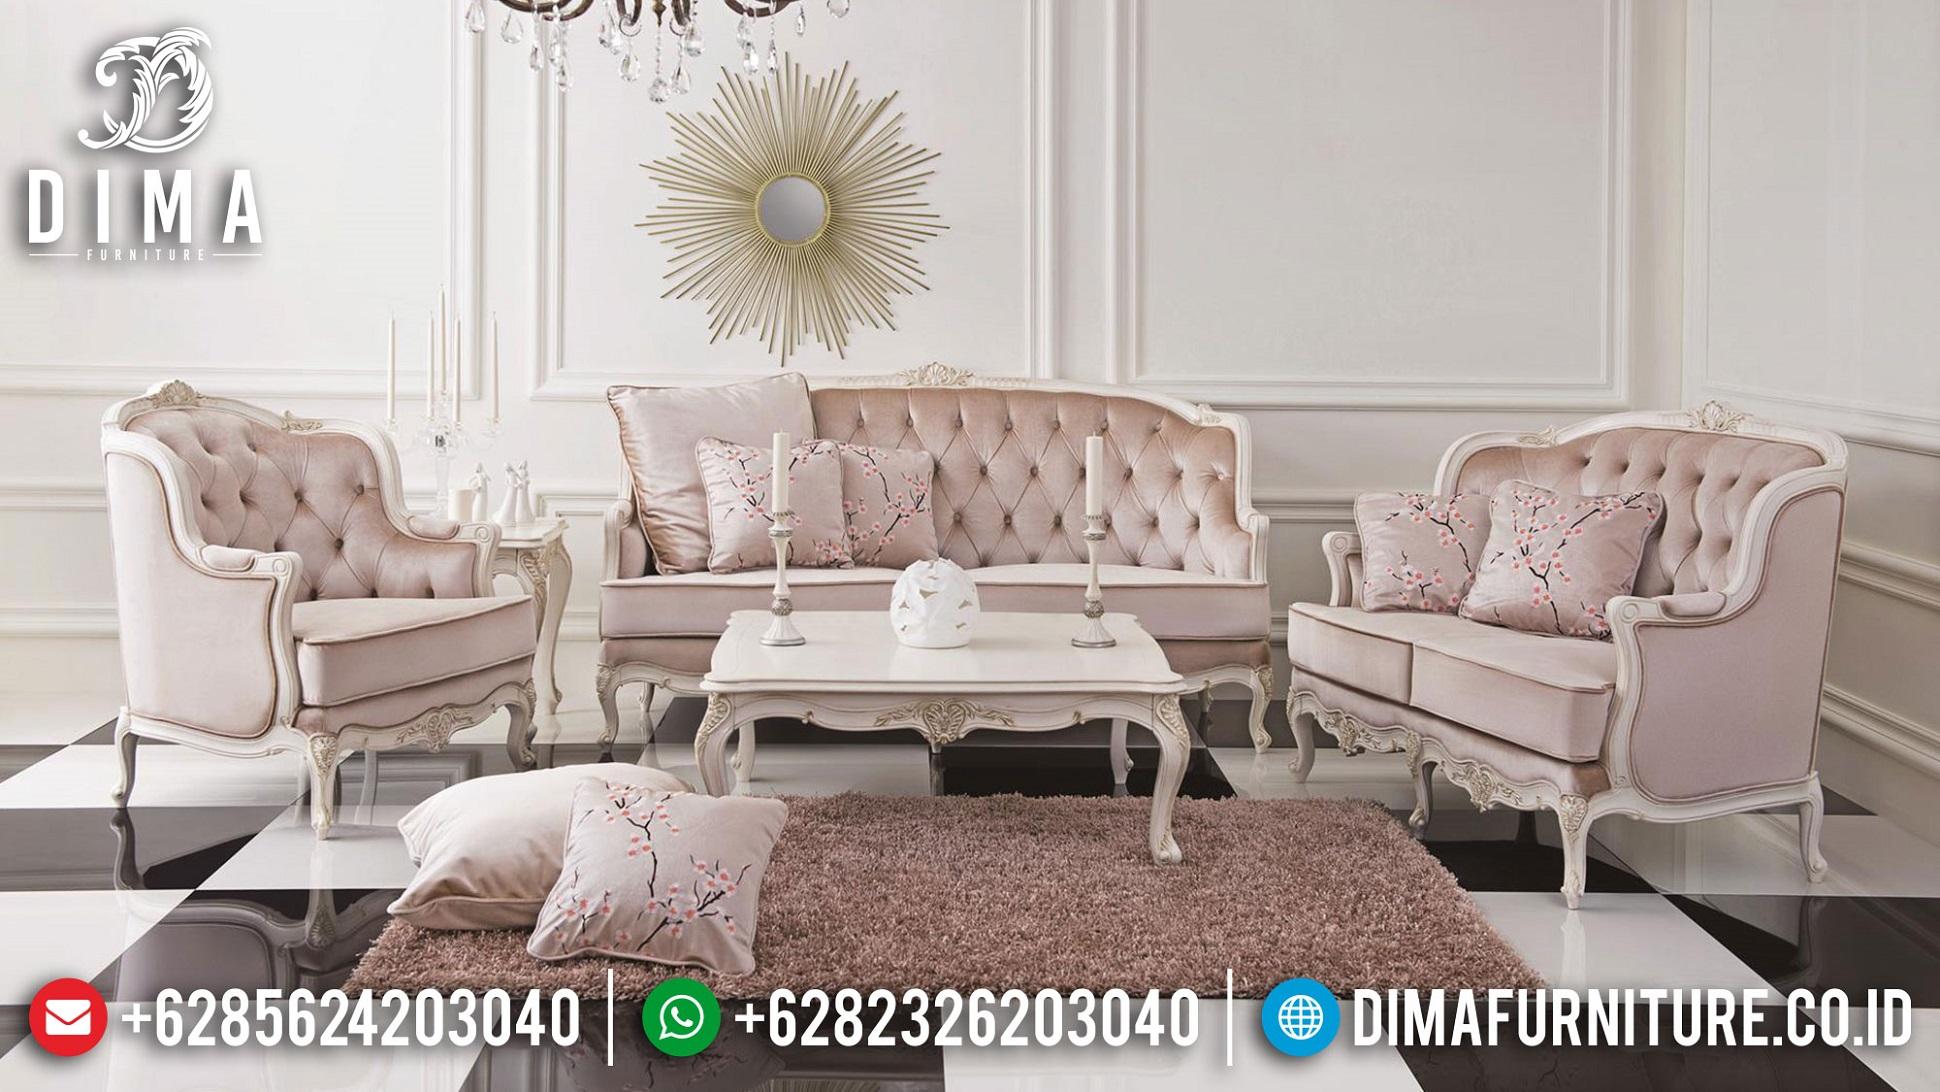 Sofa Tamu Minimalis Shabby Best Design Special Furniture Lebaran BT-1012